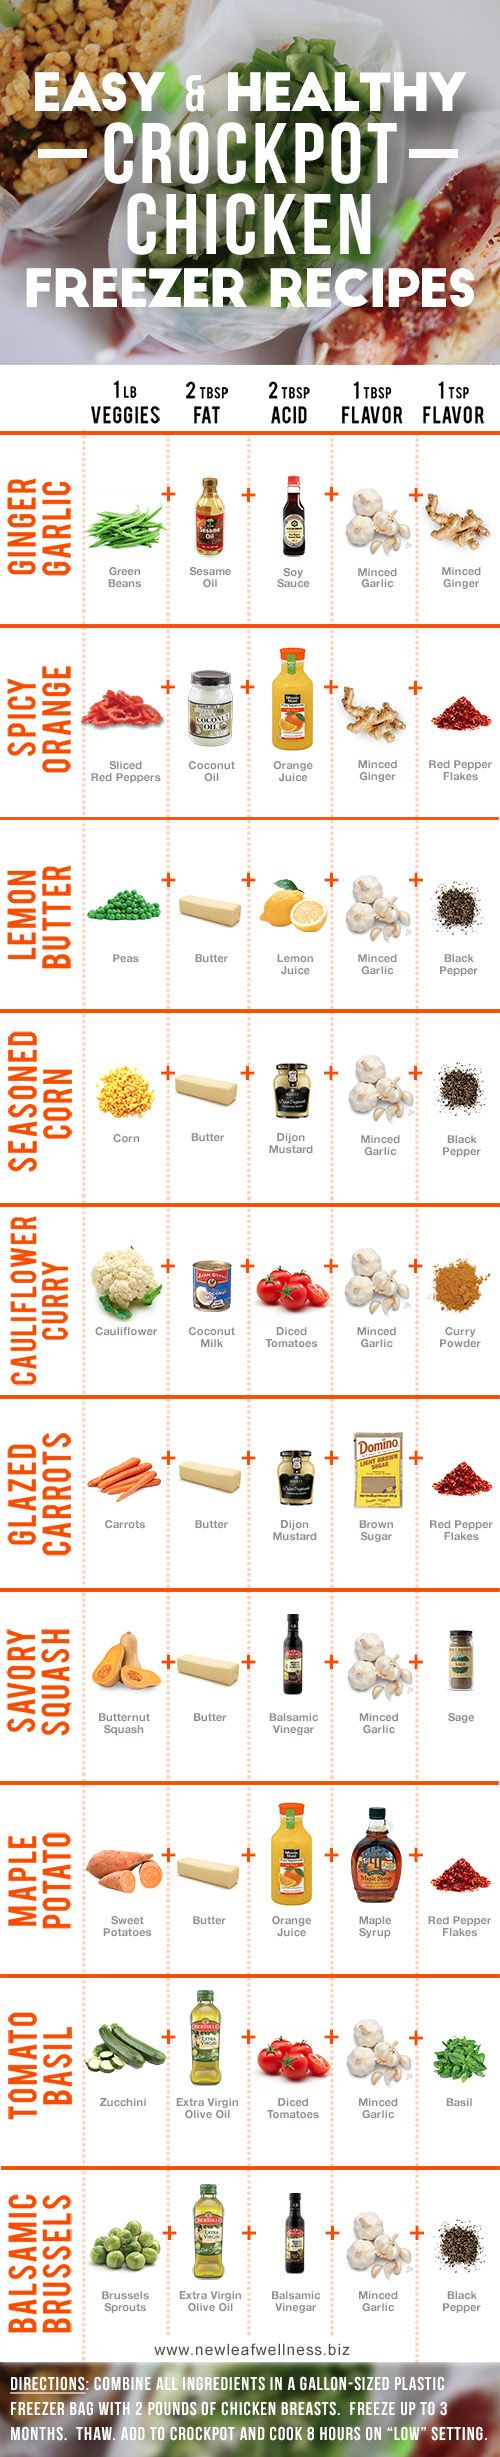 10 Easy and Healthy Crockpot Chicken Freezer Recipes (New Leaf Wellness) #healthycrockpotchickenrecipes